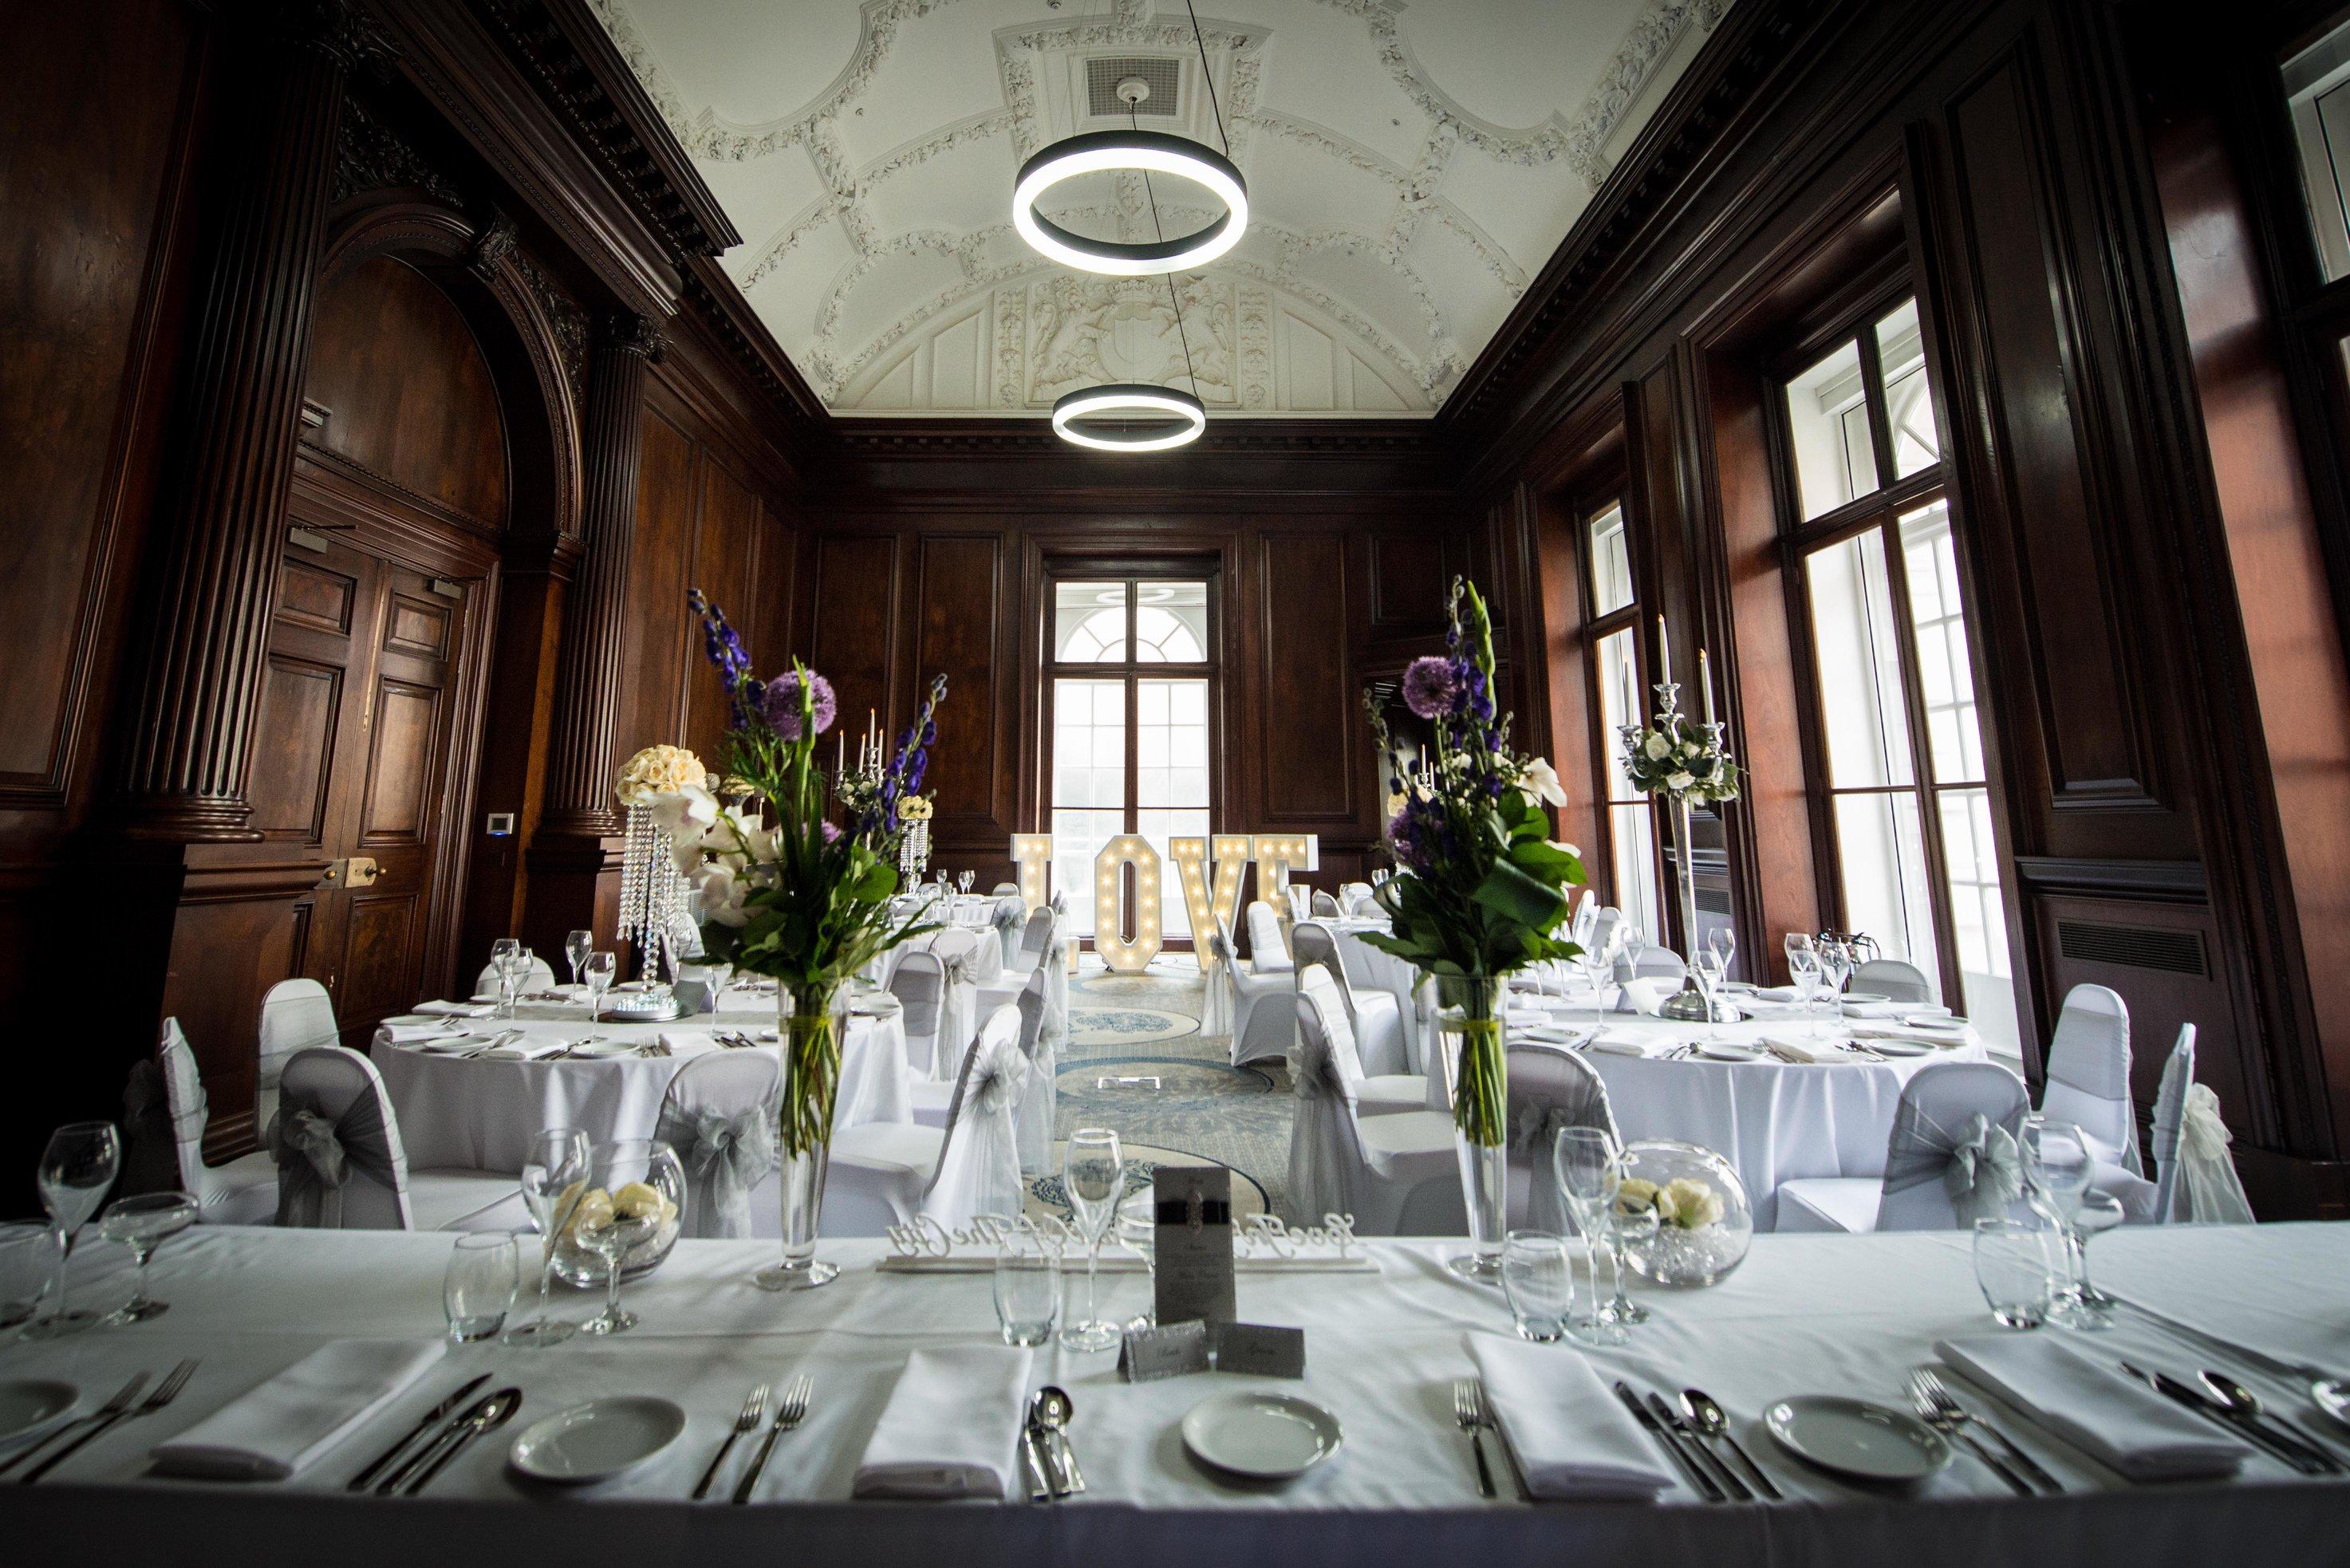 James Doyle Suite - Aloft Hotel Liverpool